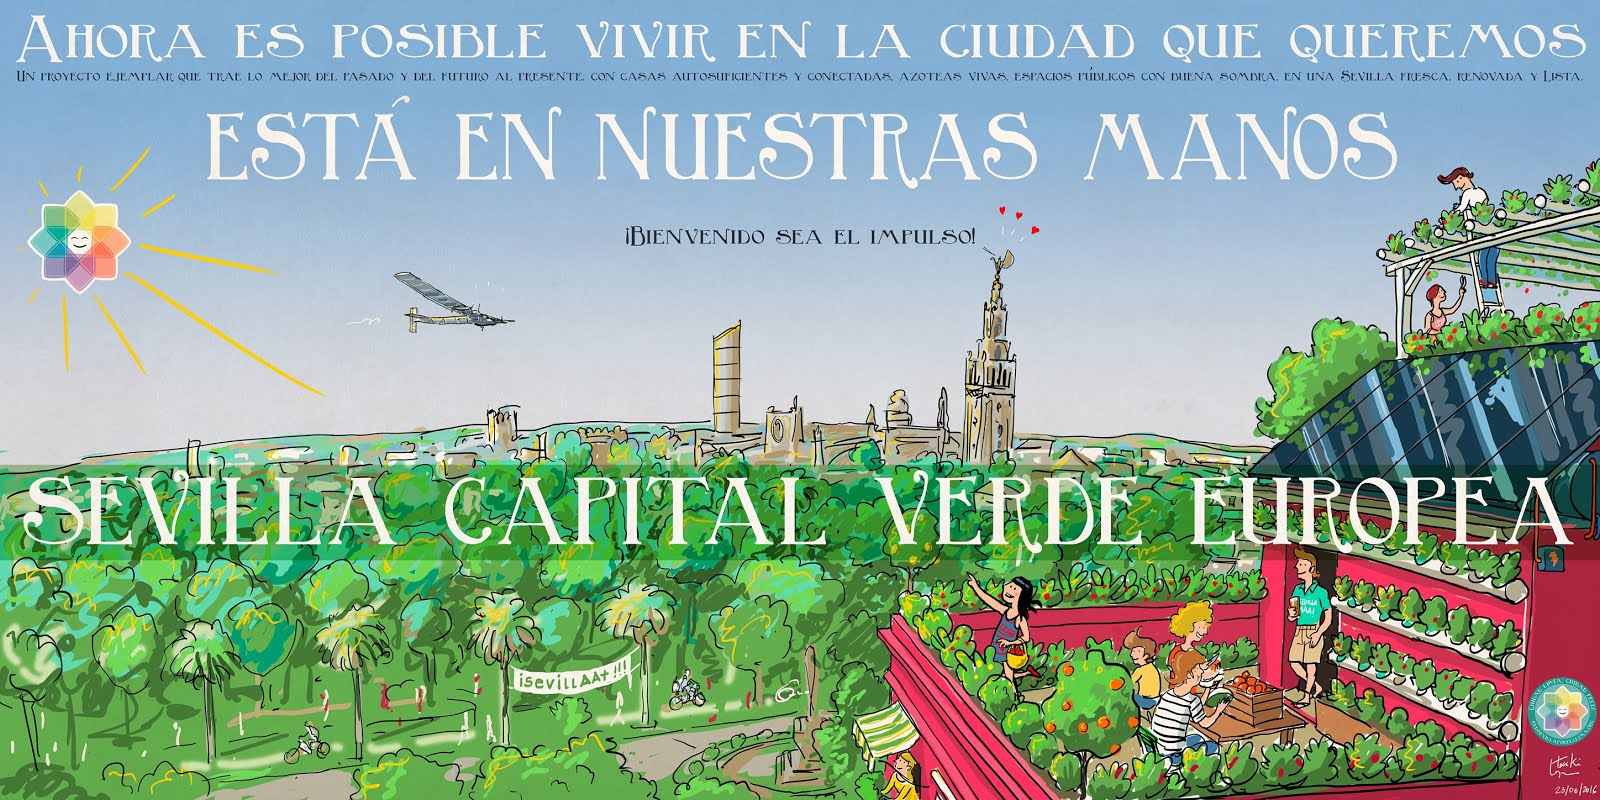 Sevilla, ciudad candidata a la Capital Verde Europea